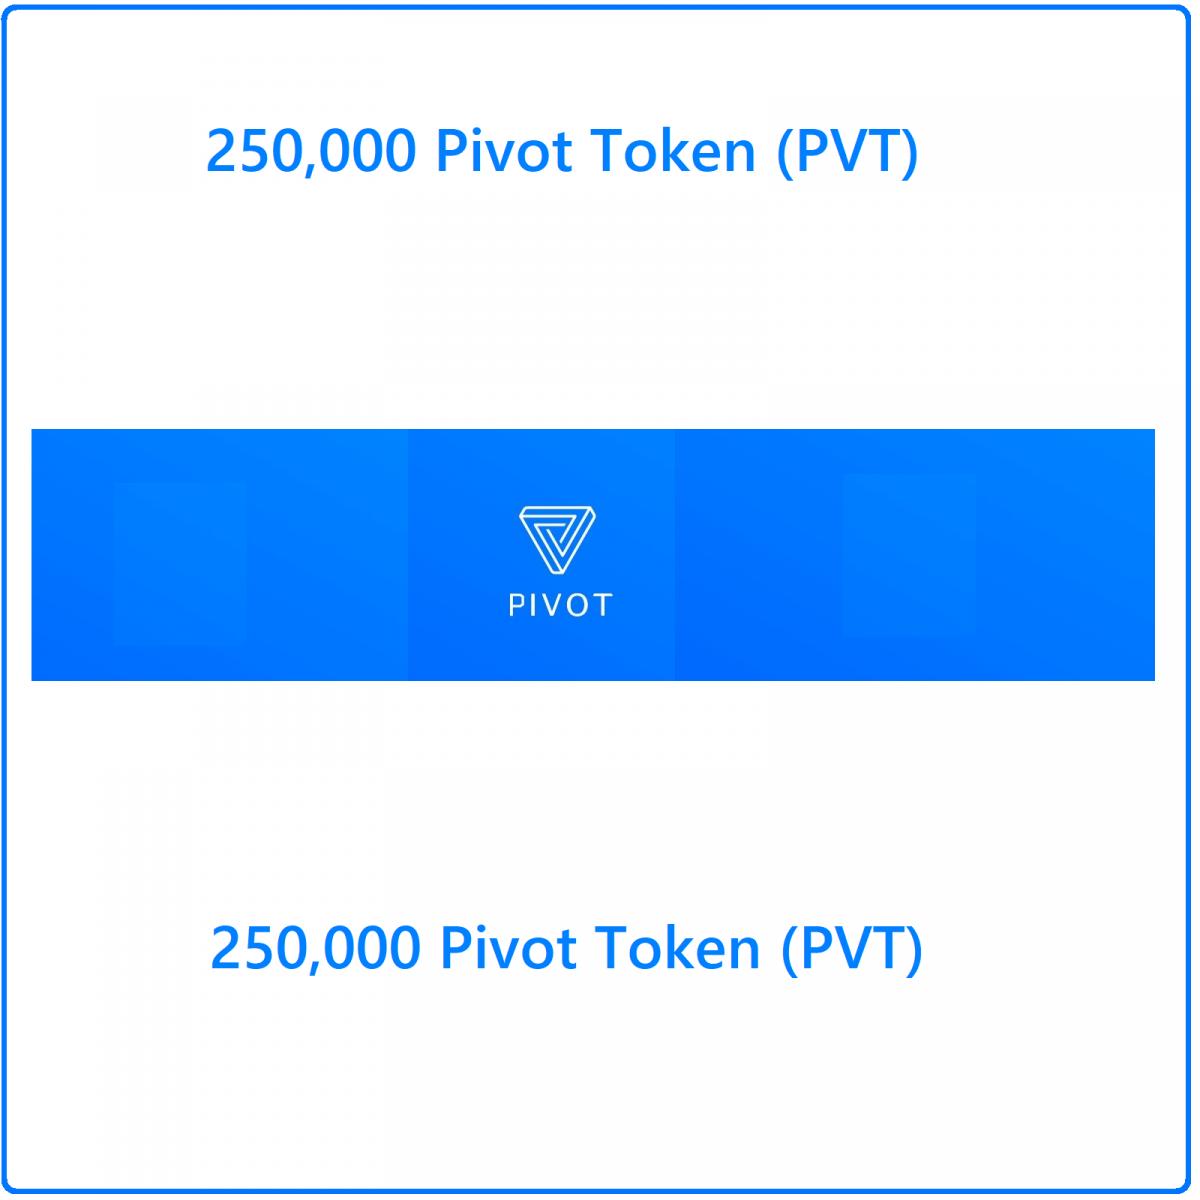 250000 Pivot token (PVT) Mining Contract